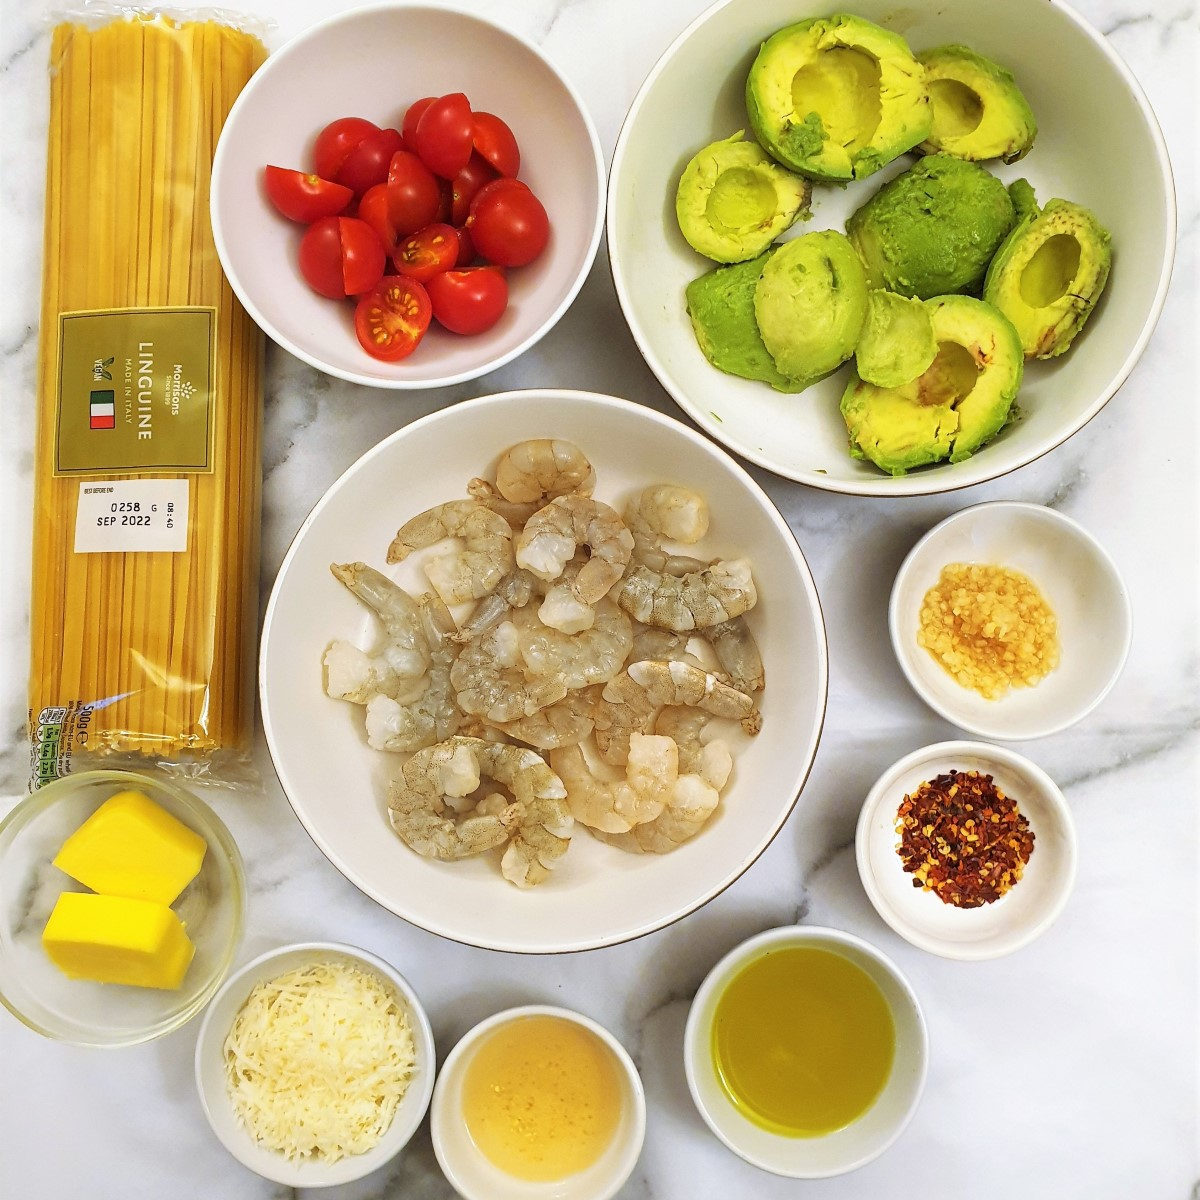 Ingredients for avocado and shrimp linguine.